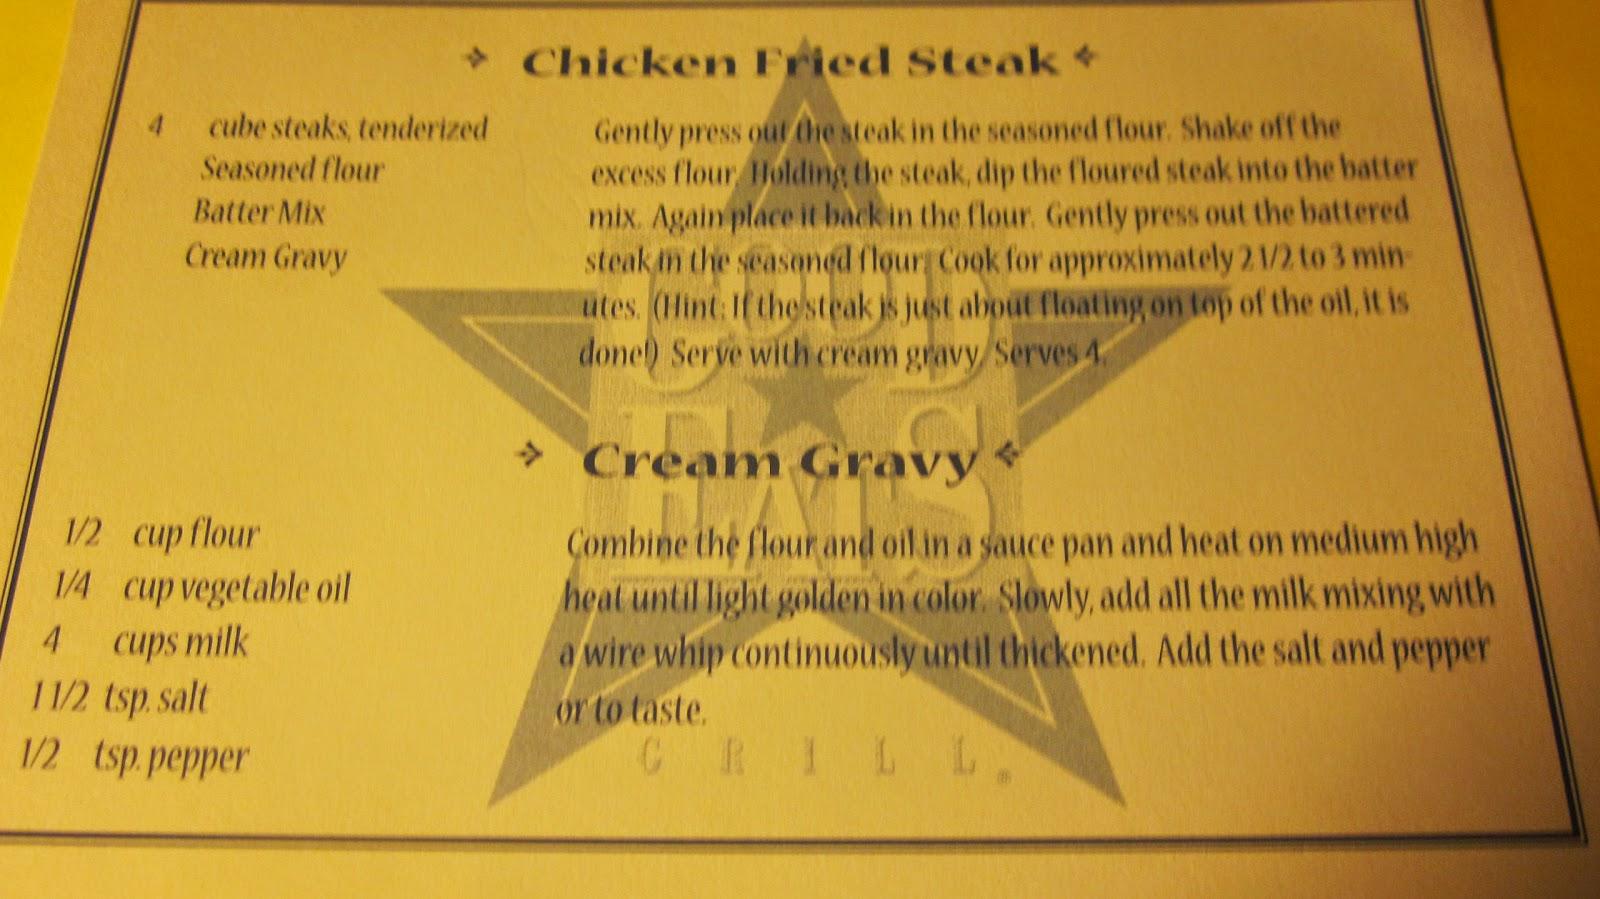 ... Vintage Recipes: GOOD EATS CHICKEN FRIED STEAK AND CREAM GRAVY